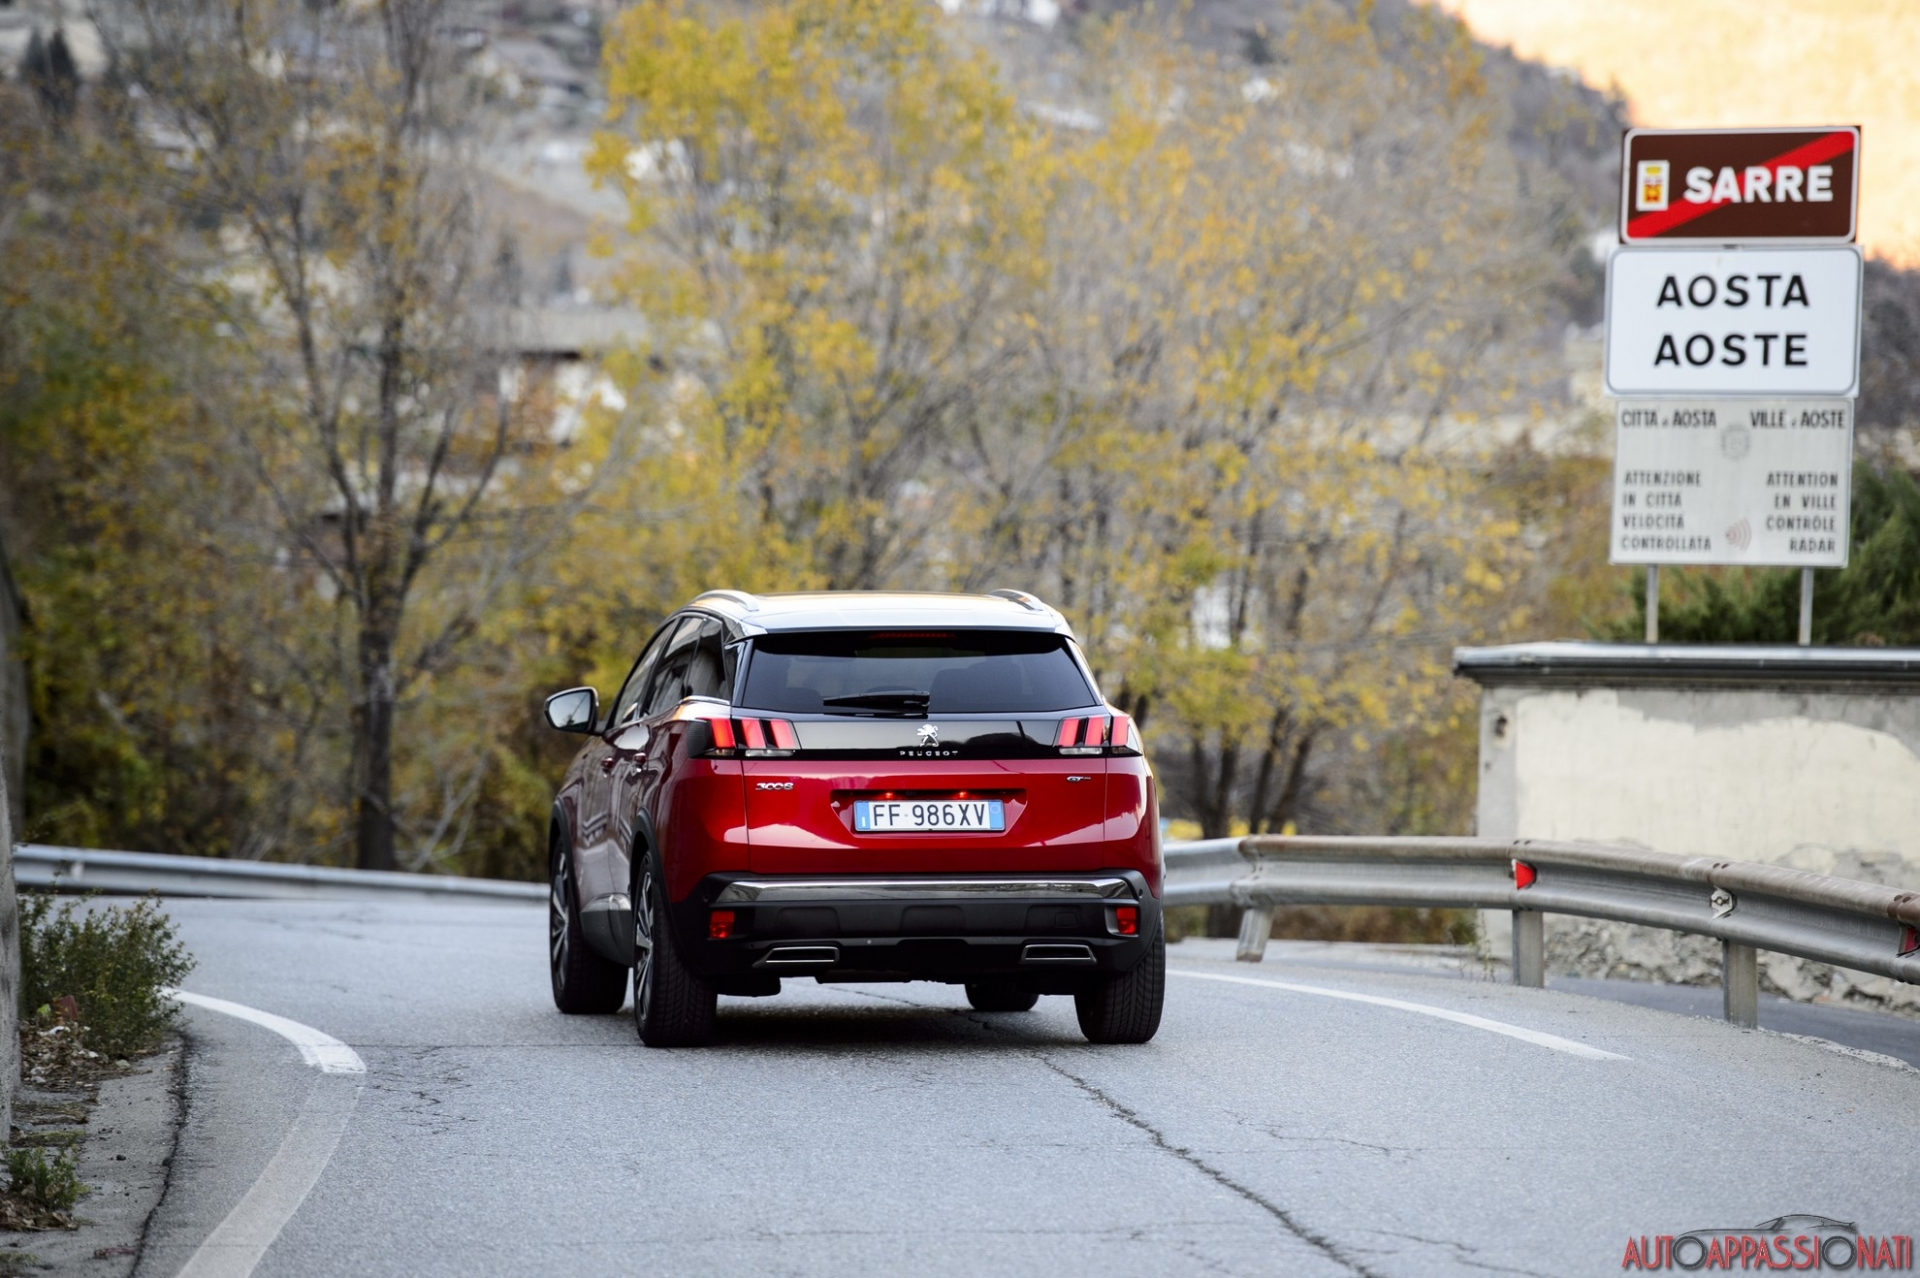 Peugeot 3008 Percorsi Italiani Valle d'Aosta